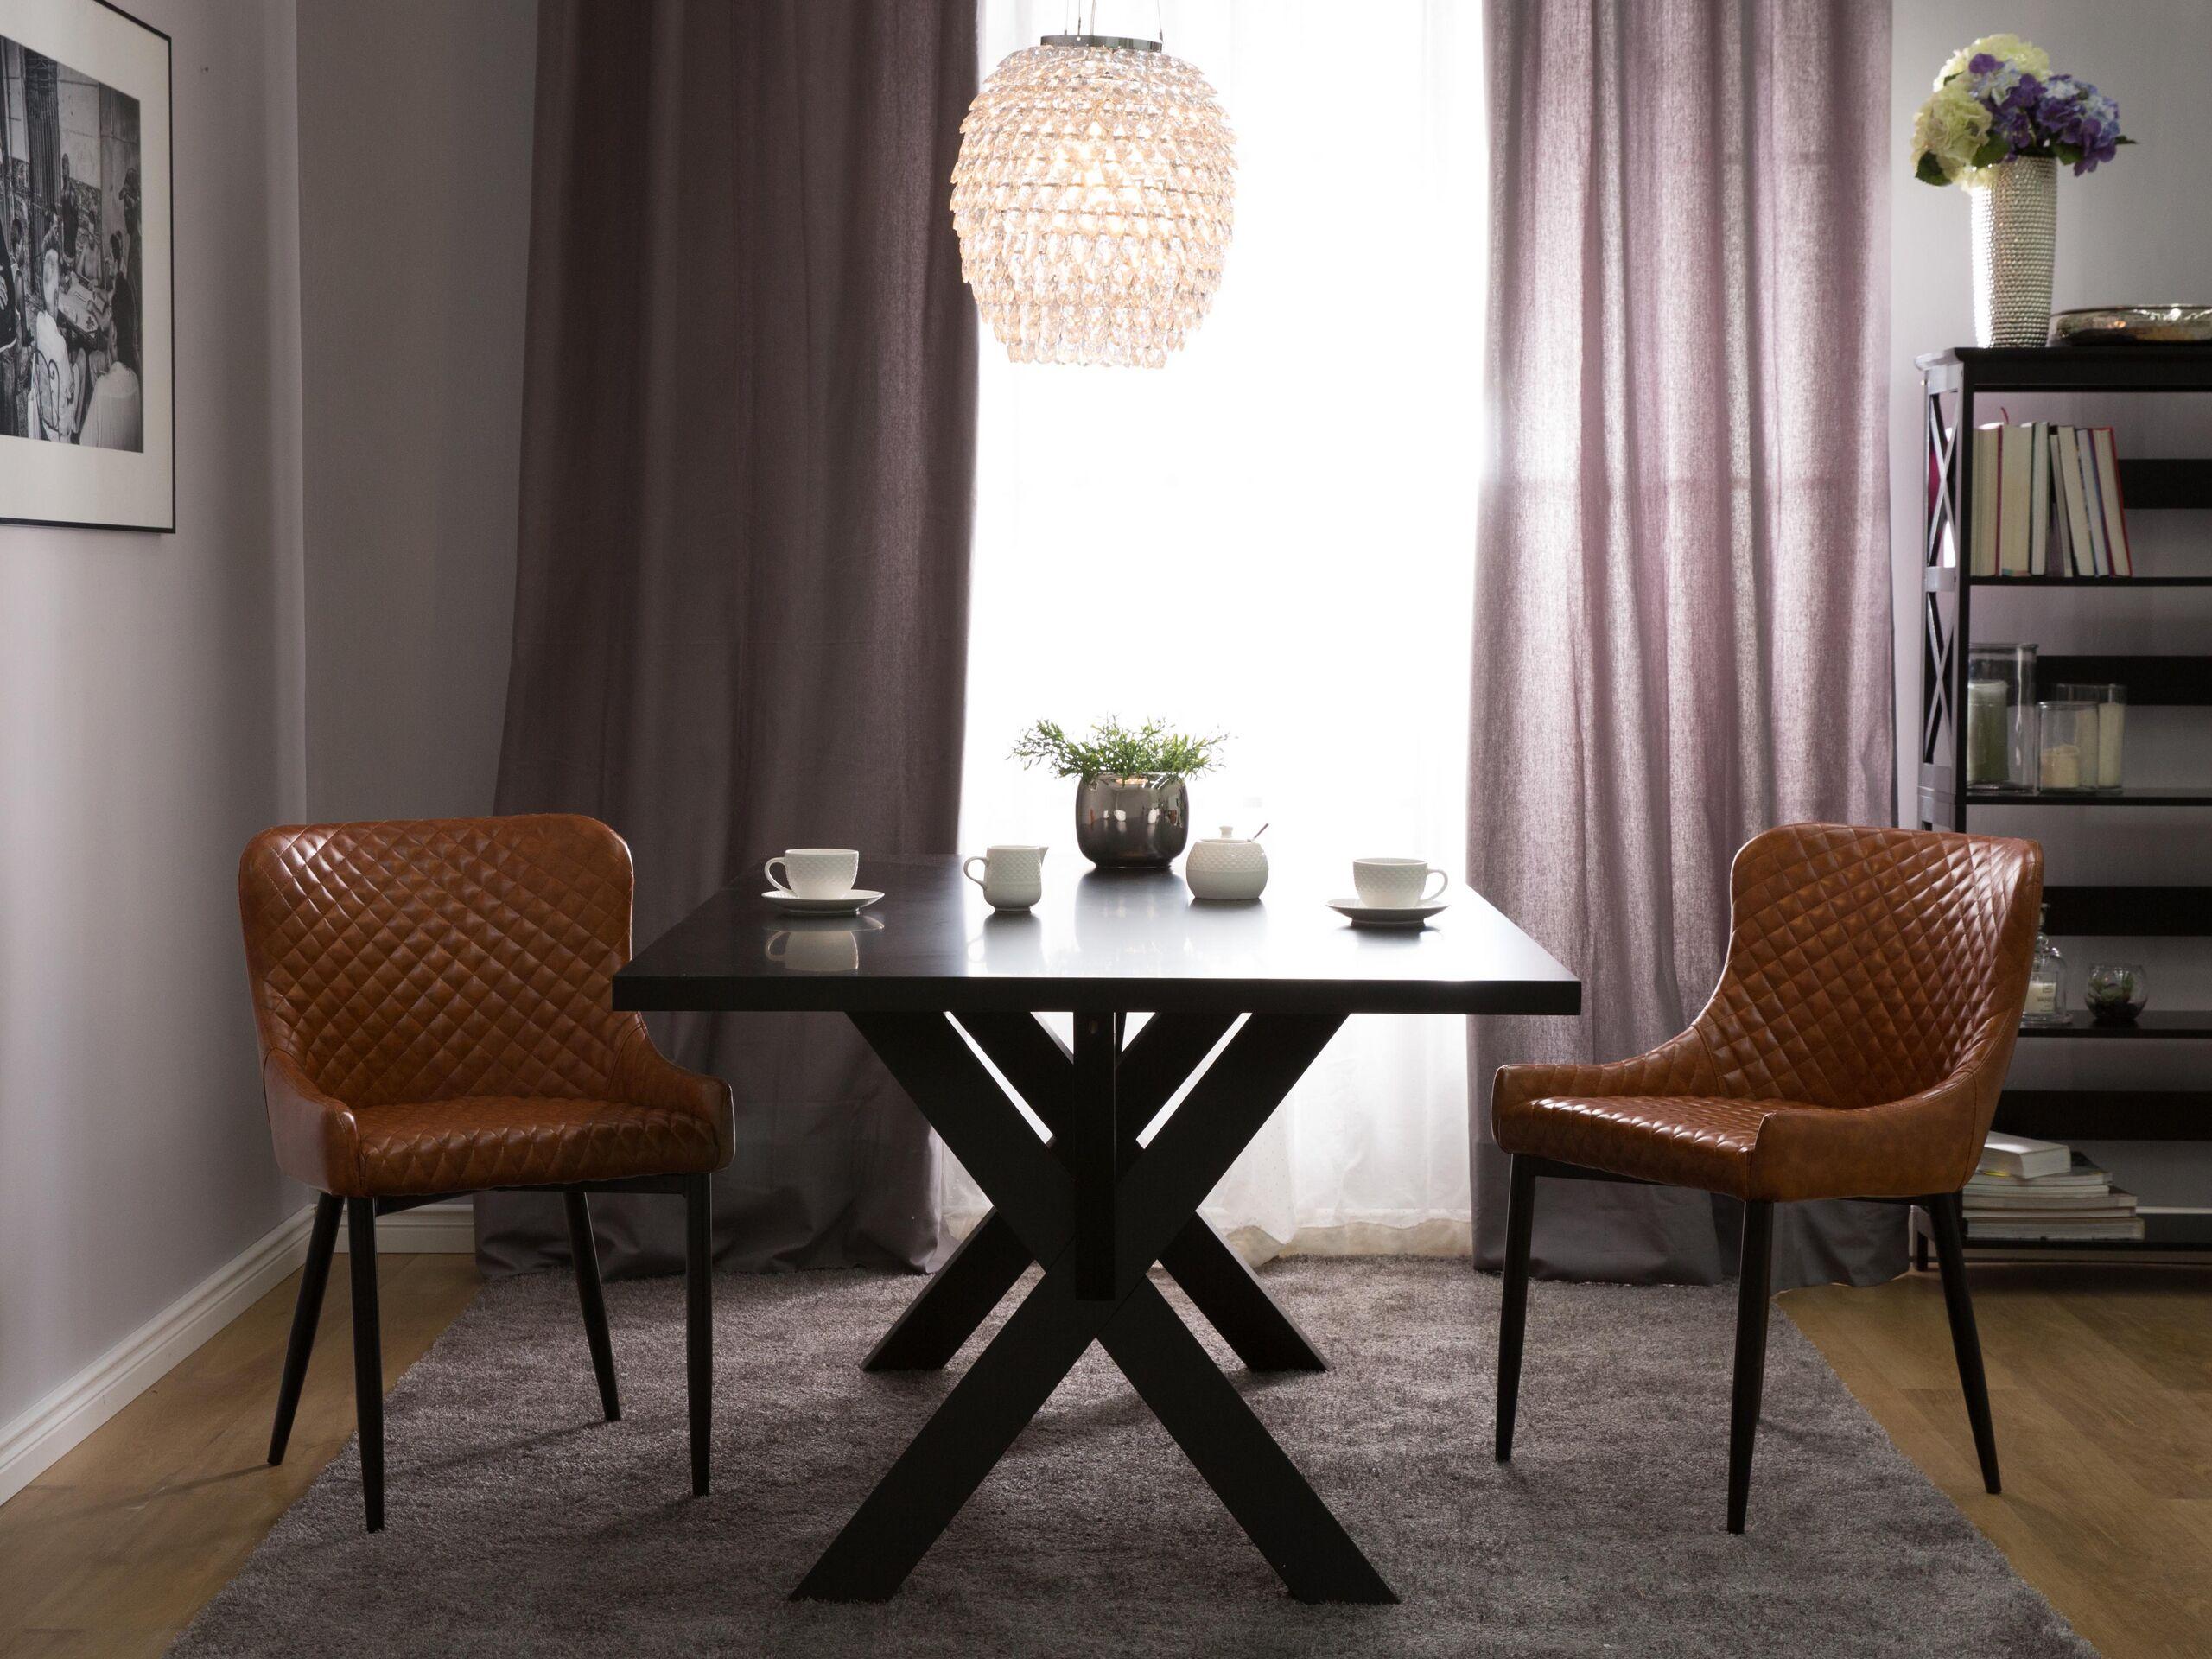 Lot de 2 chaises en simili-cuir marron